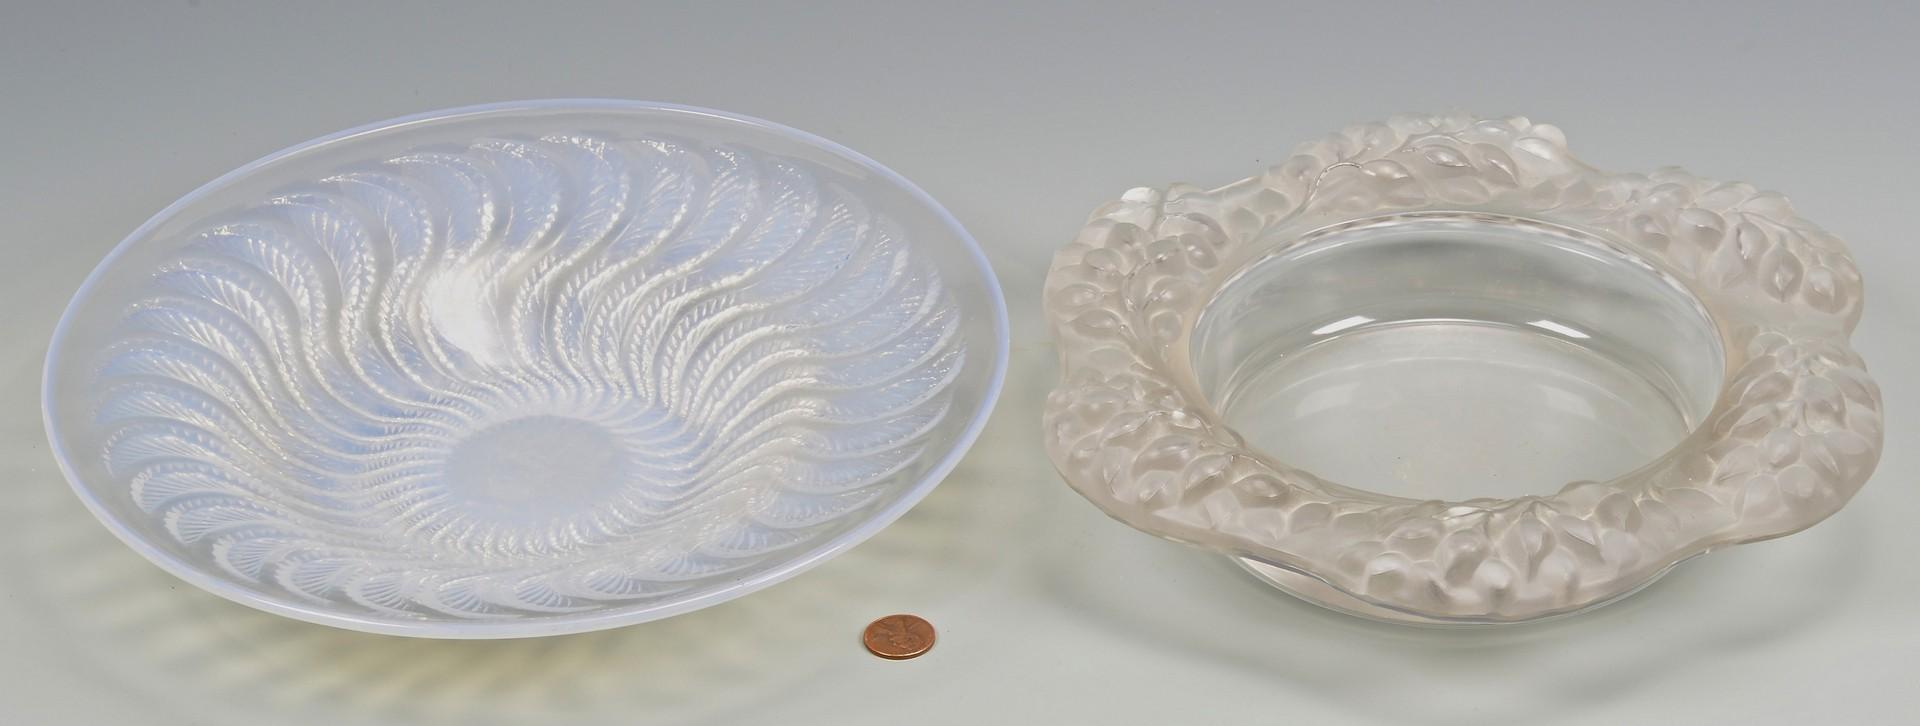 Lot 730: Rene Lalique Bowl & Wine Coaster